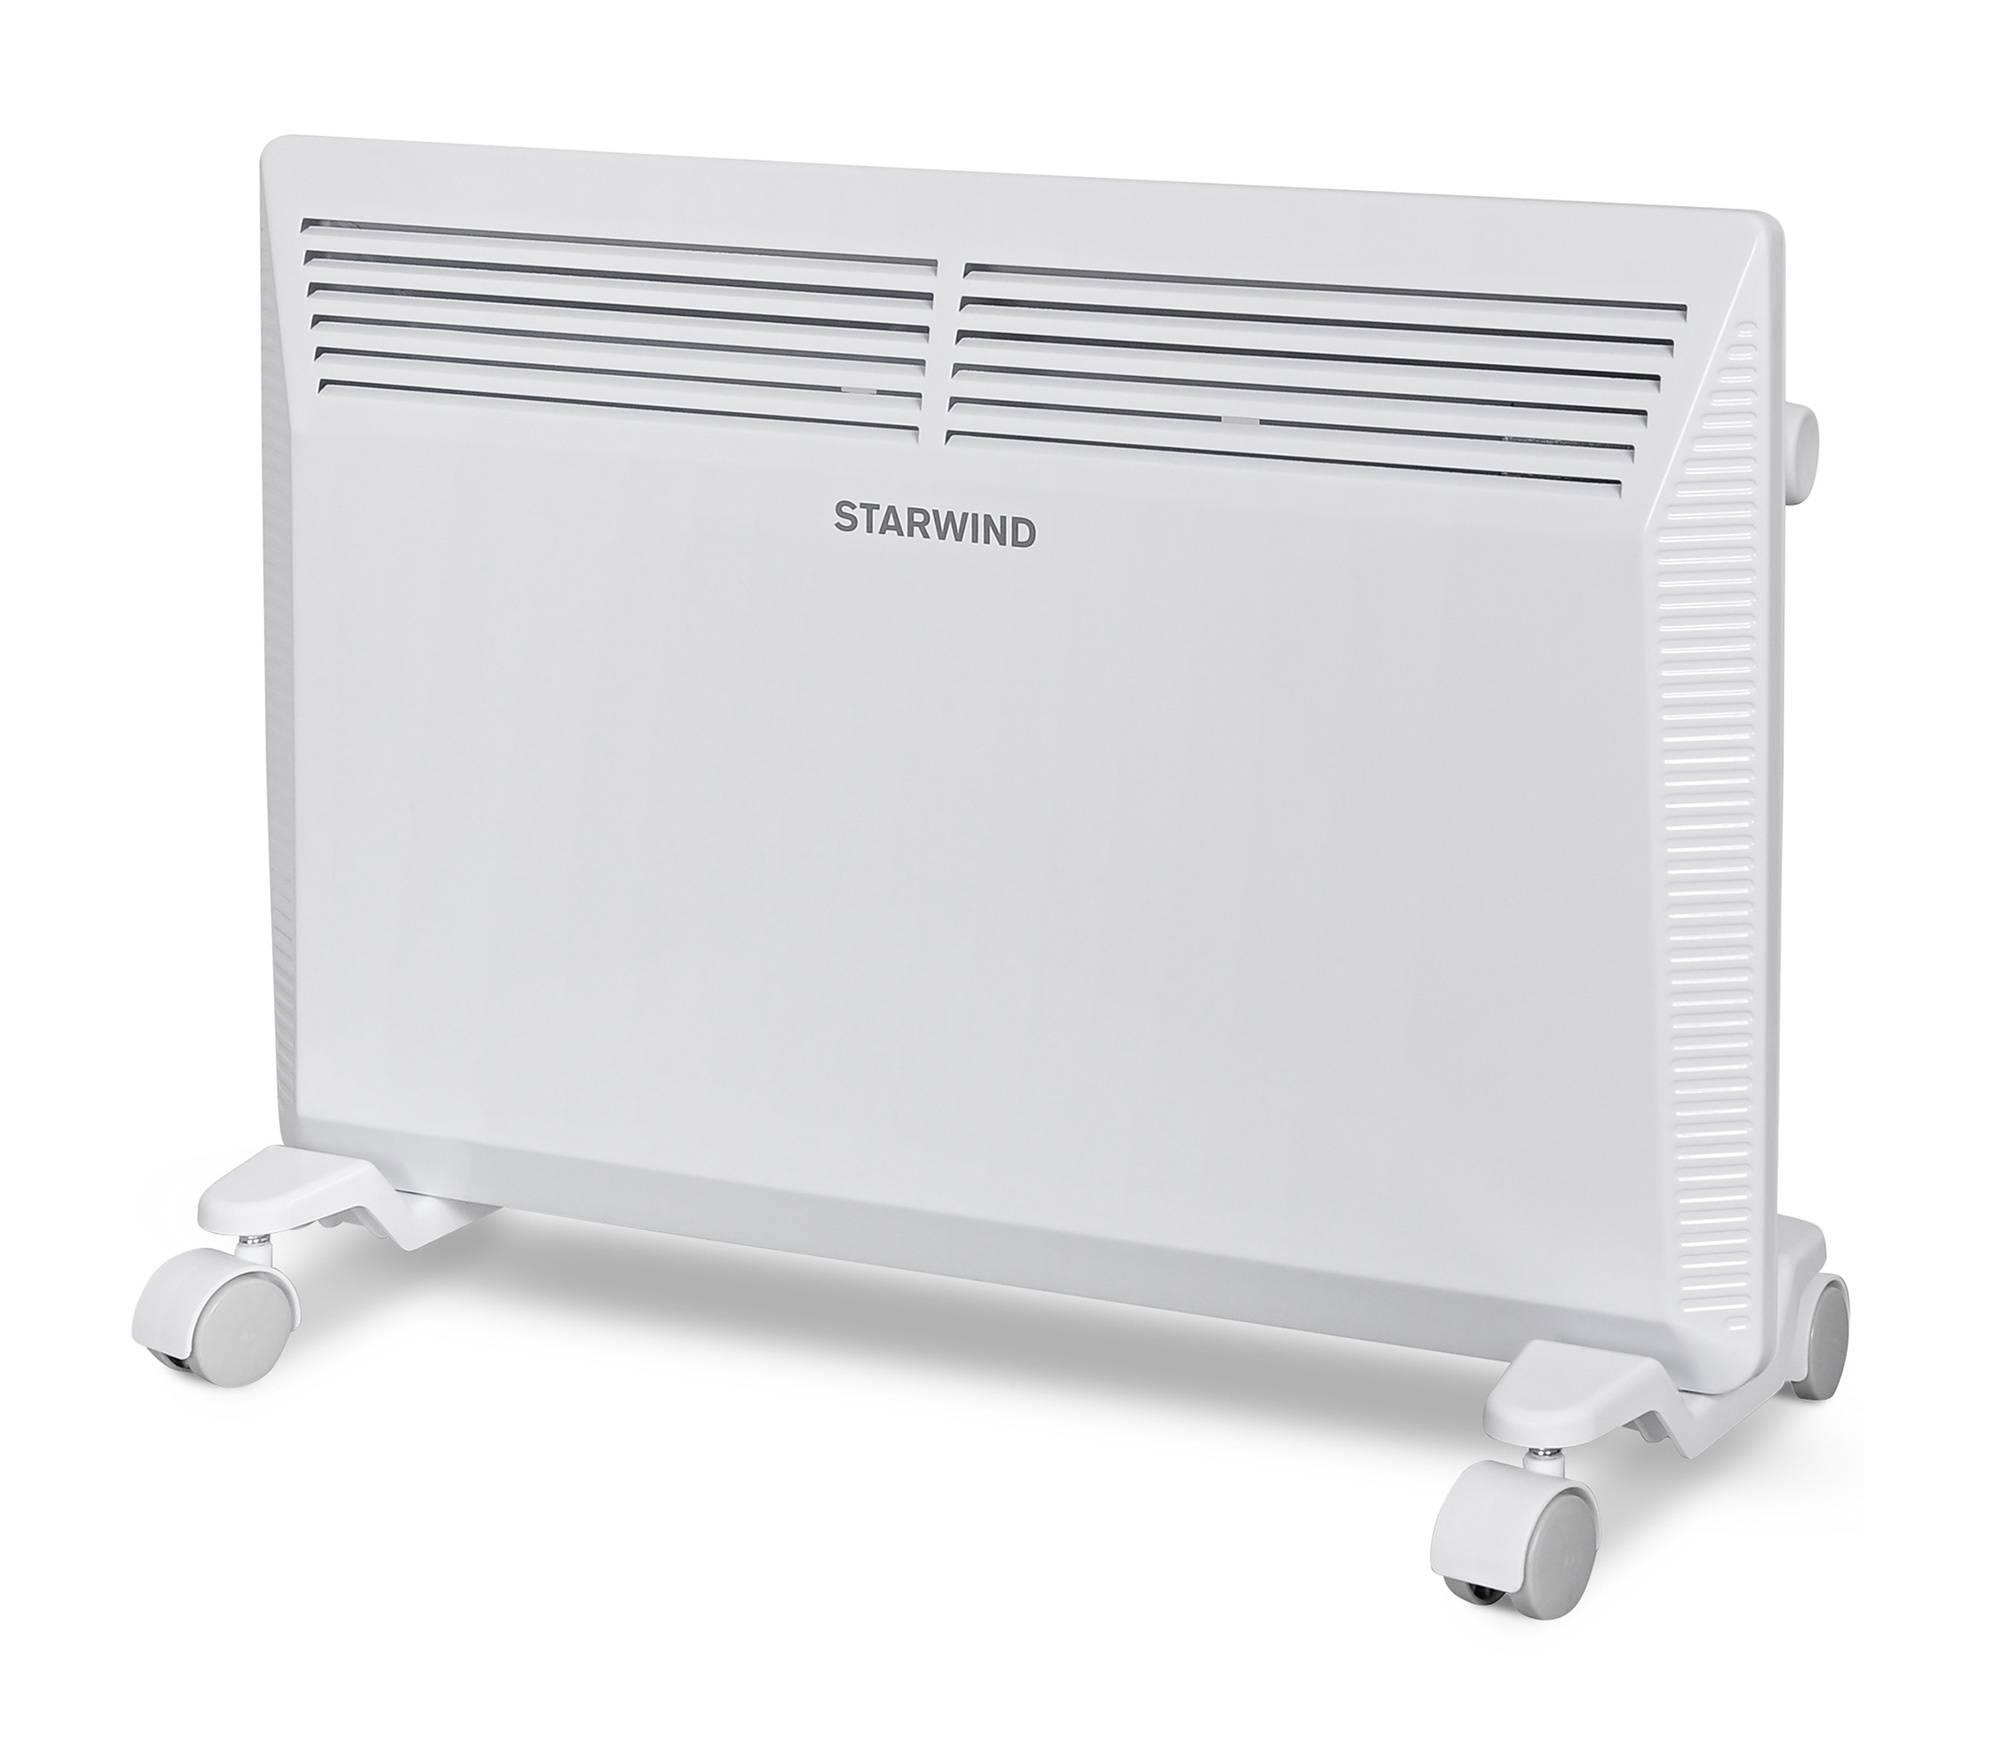 Конвектор Starwind SHV5015 белый - фото 1